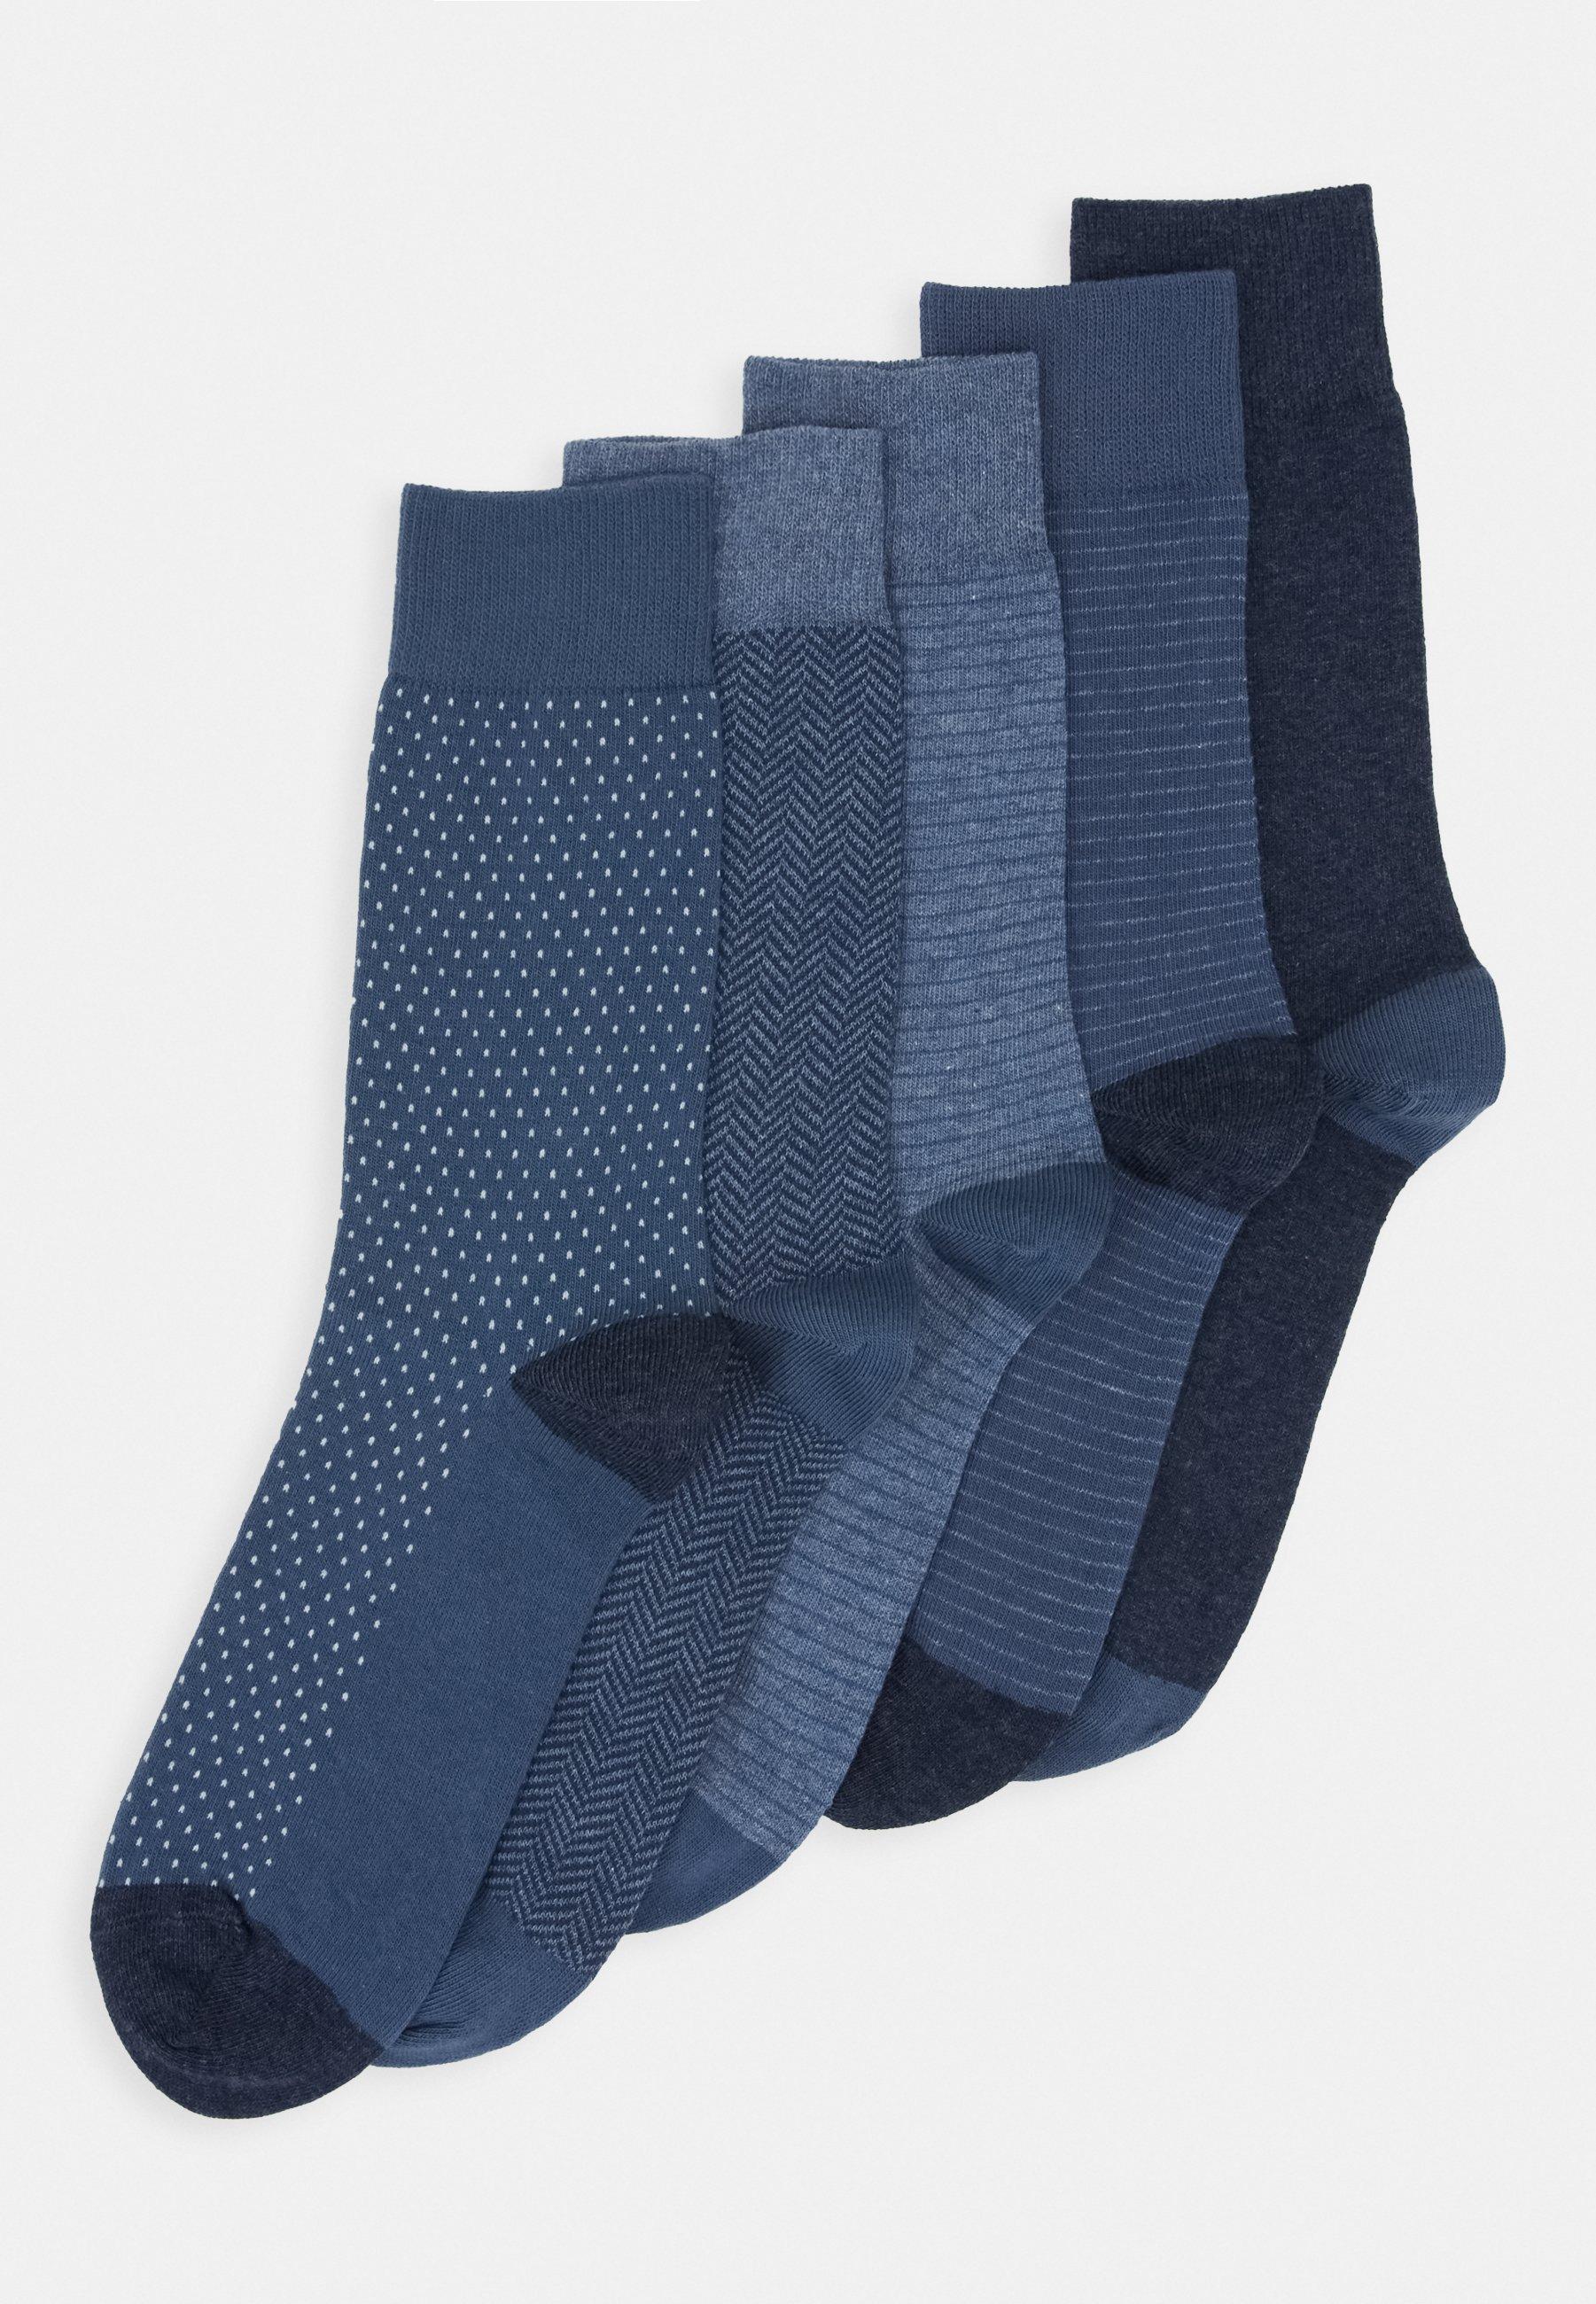 Hommes Tige chaussettes 5er Pack